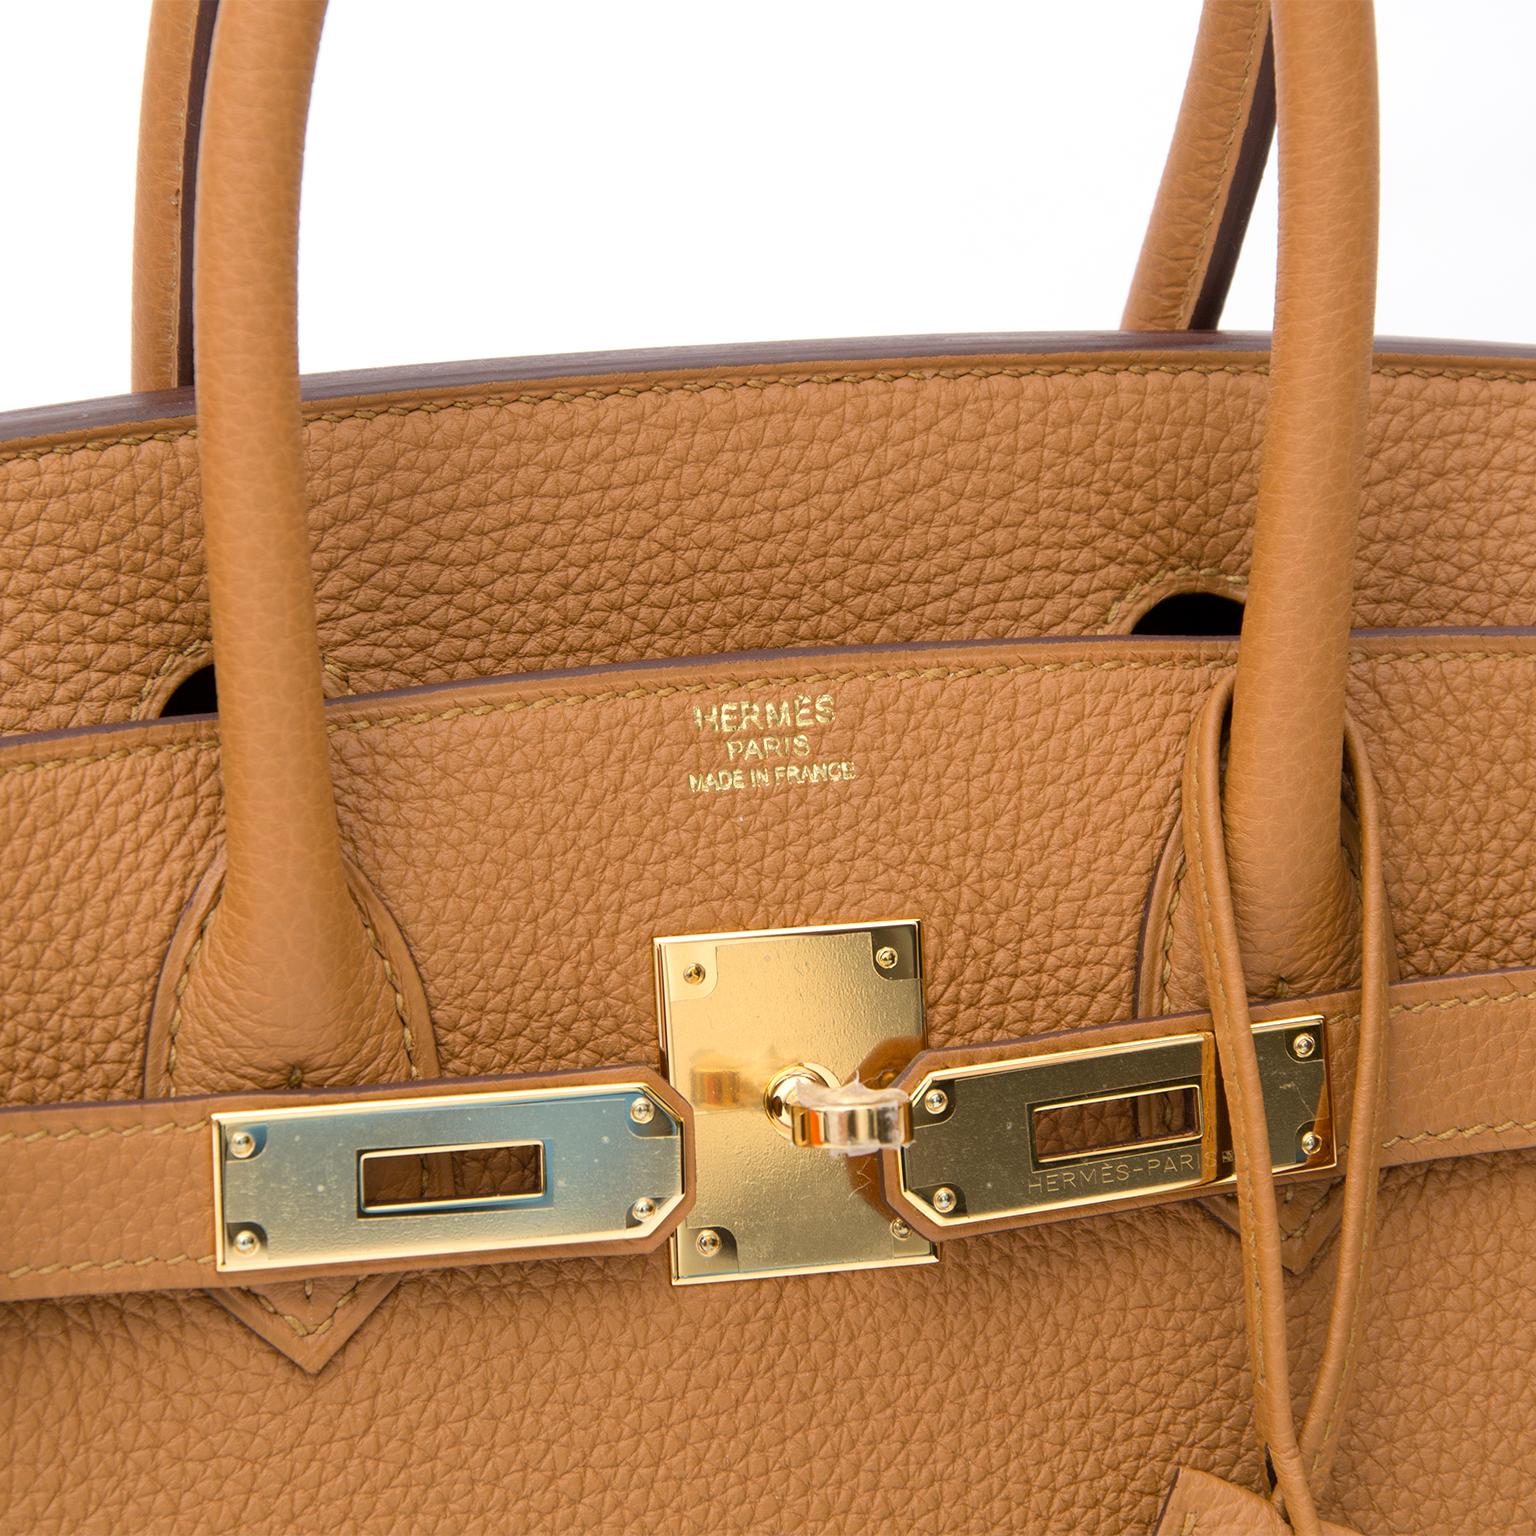 69335600a5 ... BRAND NEW Hermès Birkin Caramel Togo GHW 30 cuir seconde main occasion  sac en ligne prix